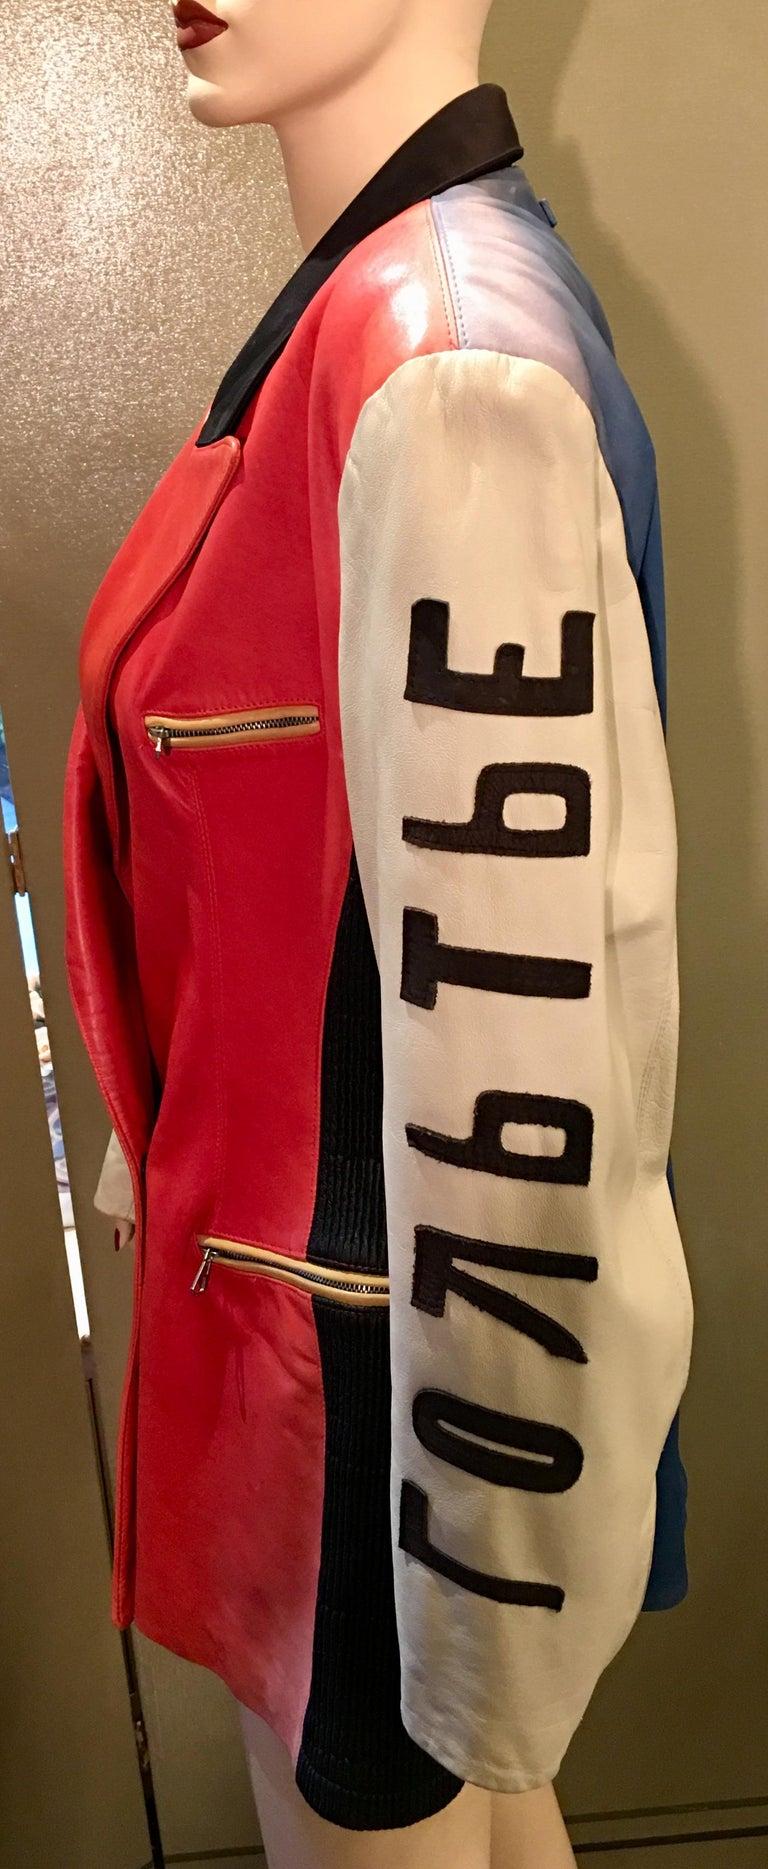 "Vintage Jean Paul Gaultier Leather Coat ""Russian Constructivist"" Collection 1986 For Sale 1"